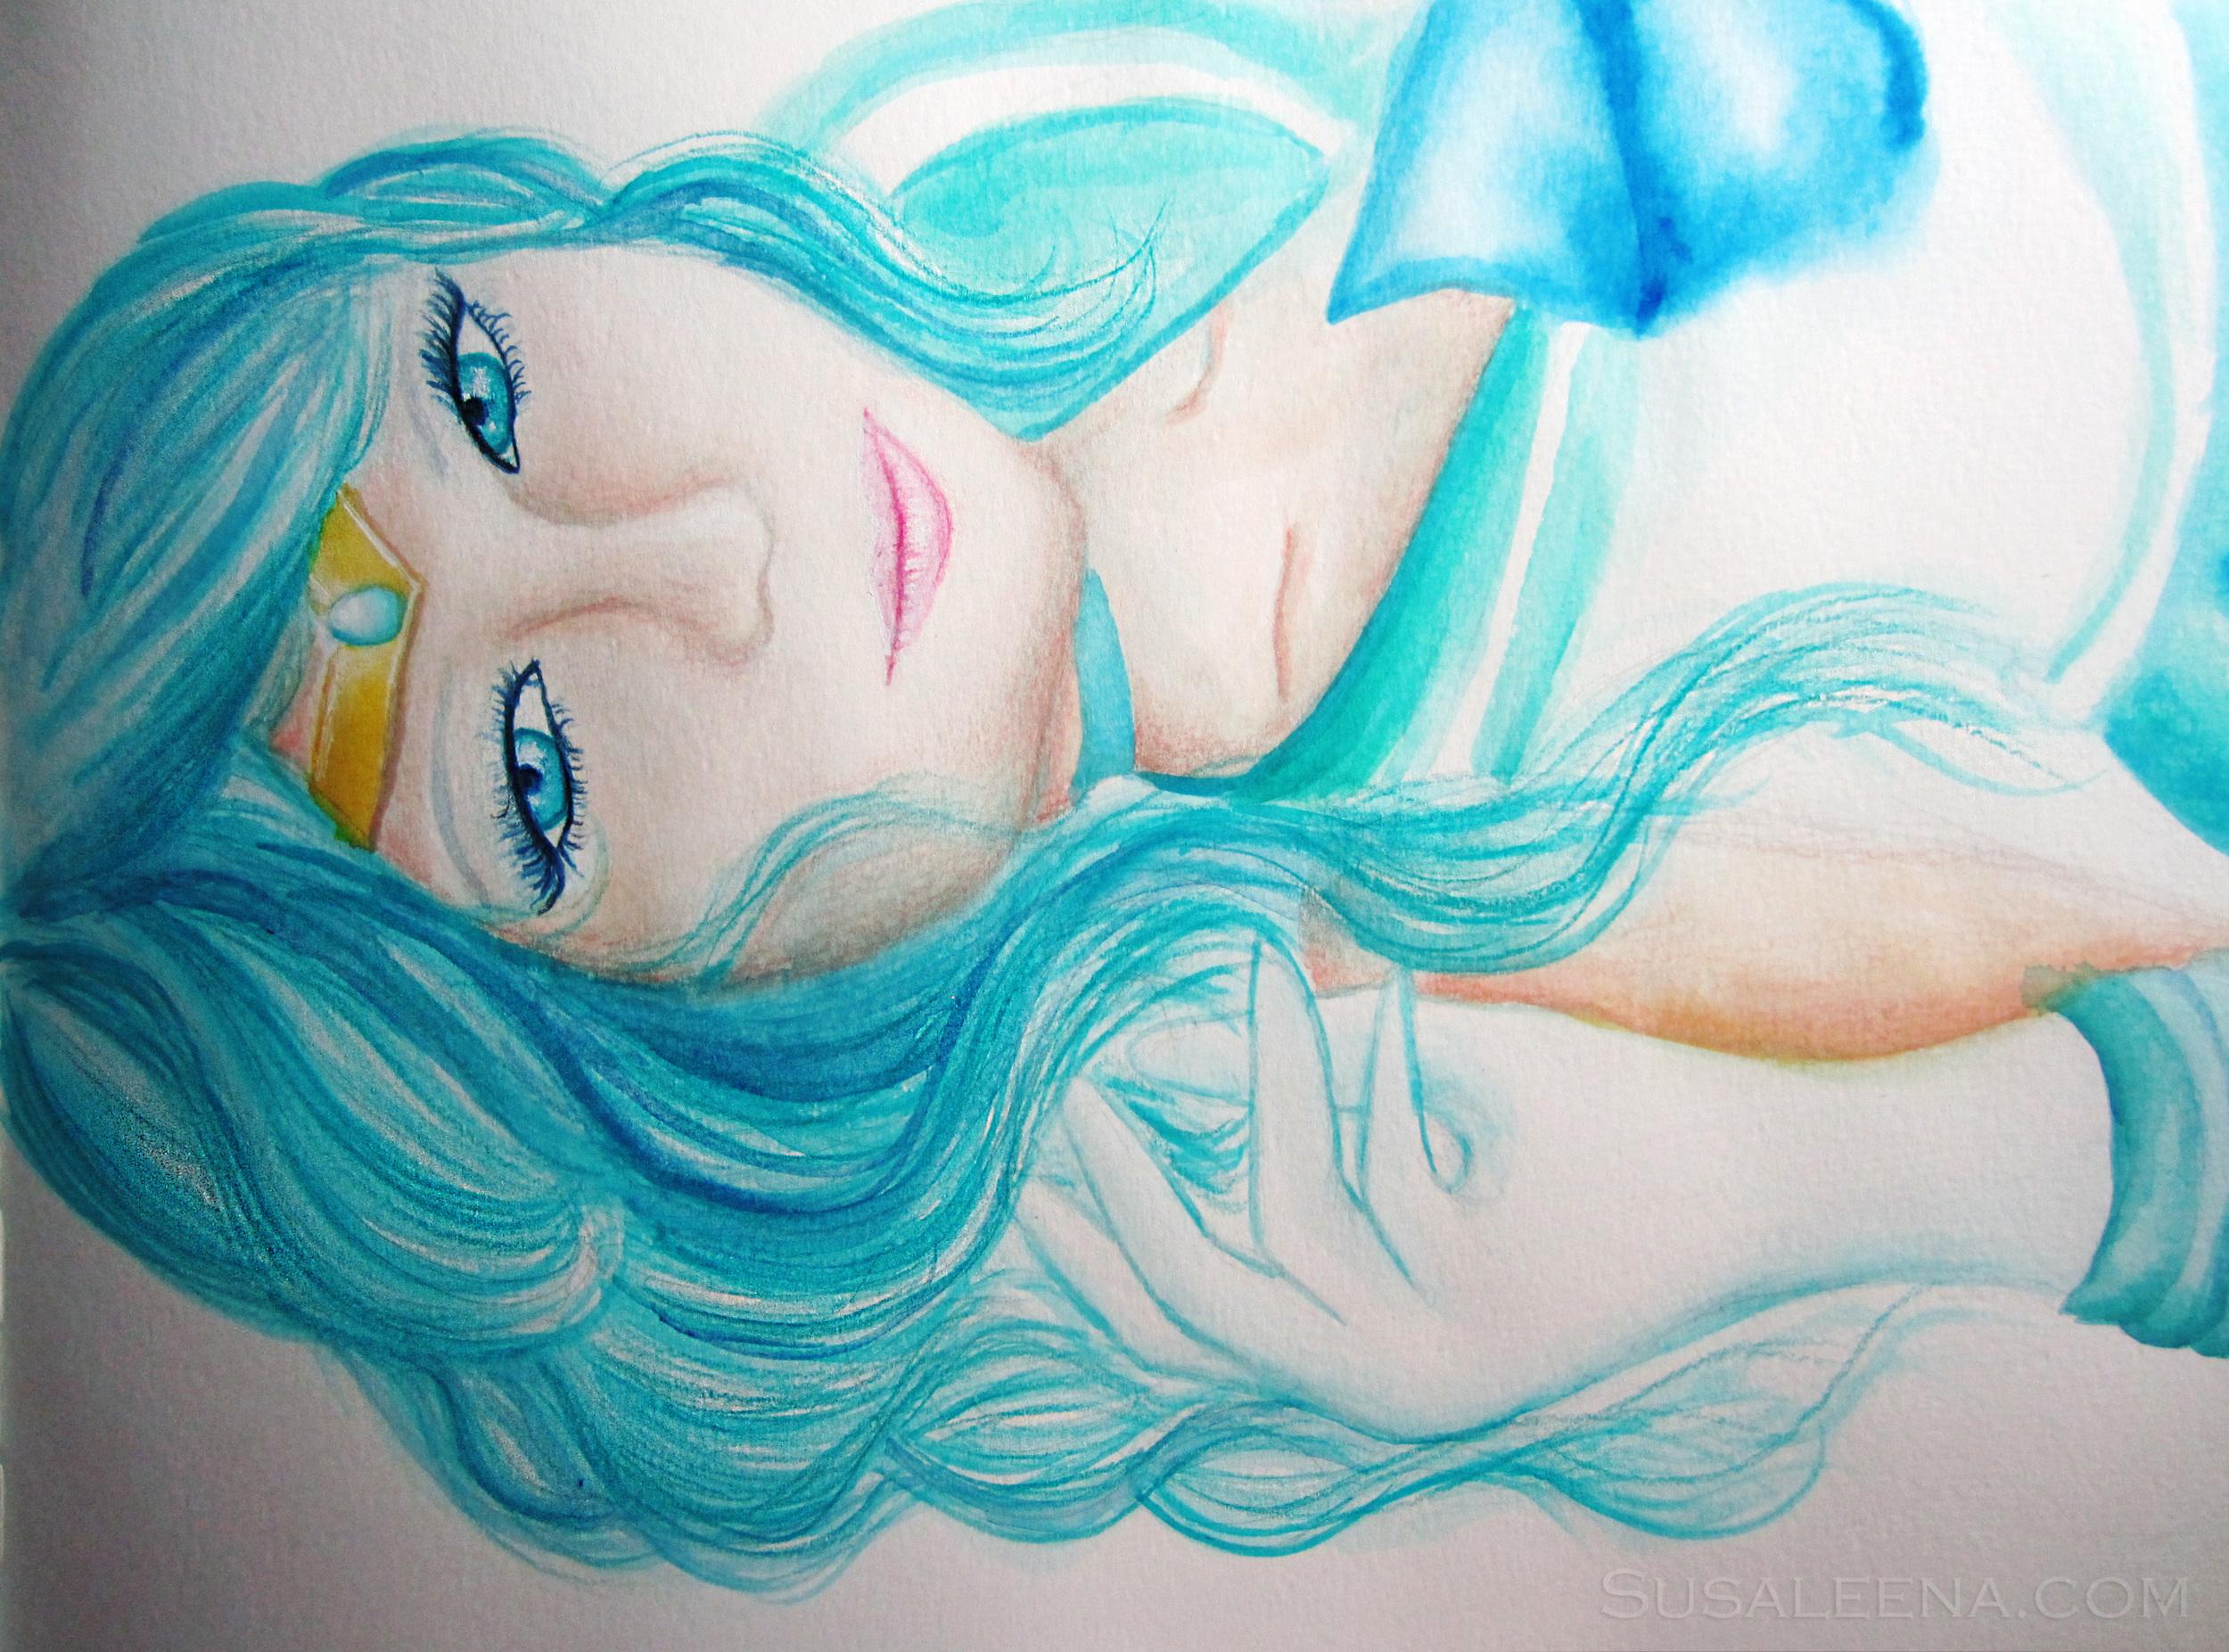 Sailor Neptune - I adore the paint color